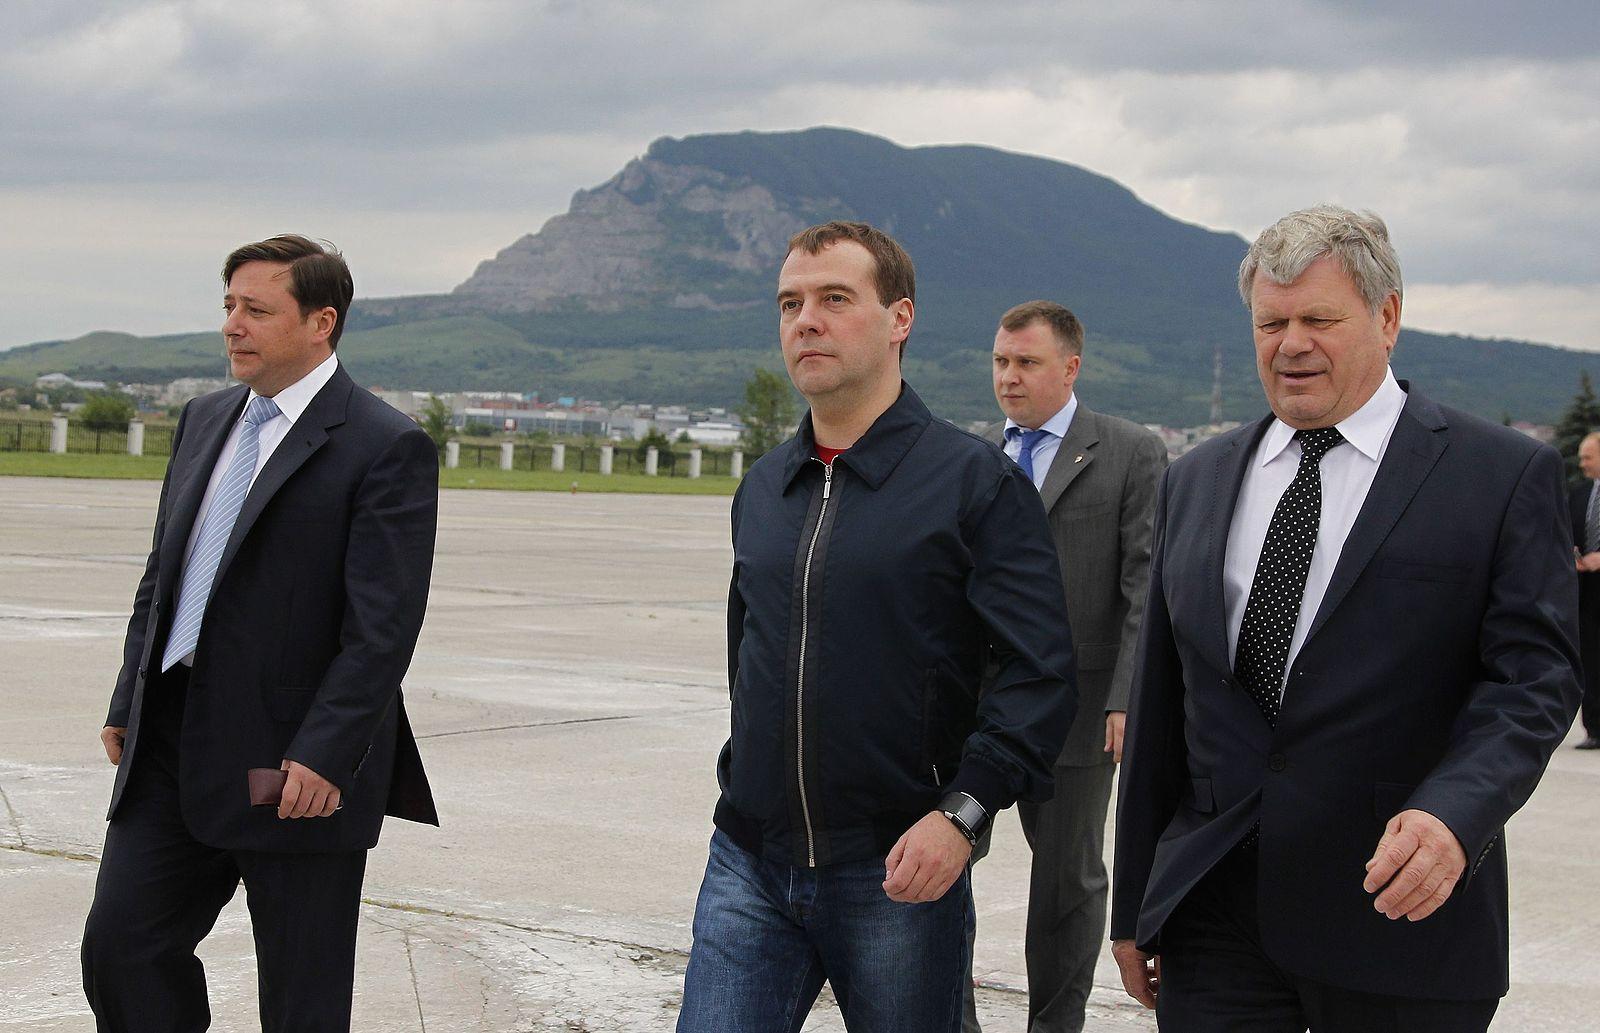 File:Aleksandr Khloponin, Dmitry Medvedev and Valery Zerenkov 18 June 2012.jpeg - Wikimedia Commons